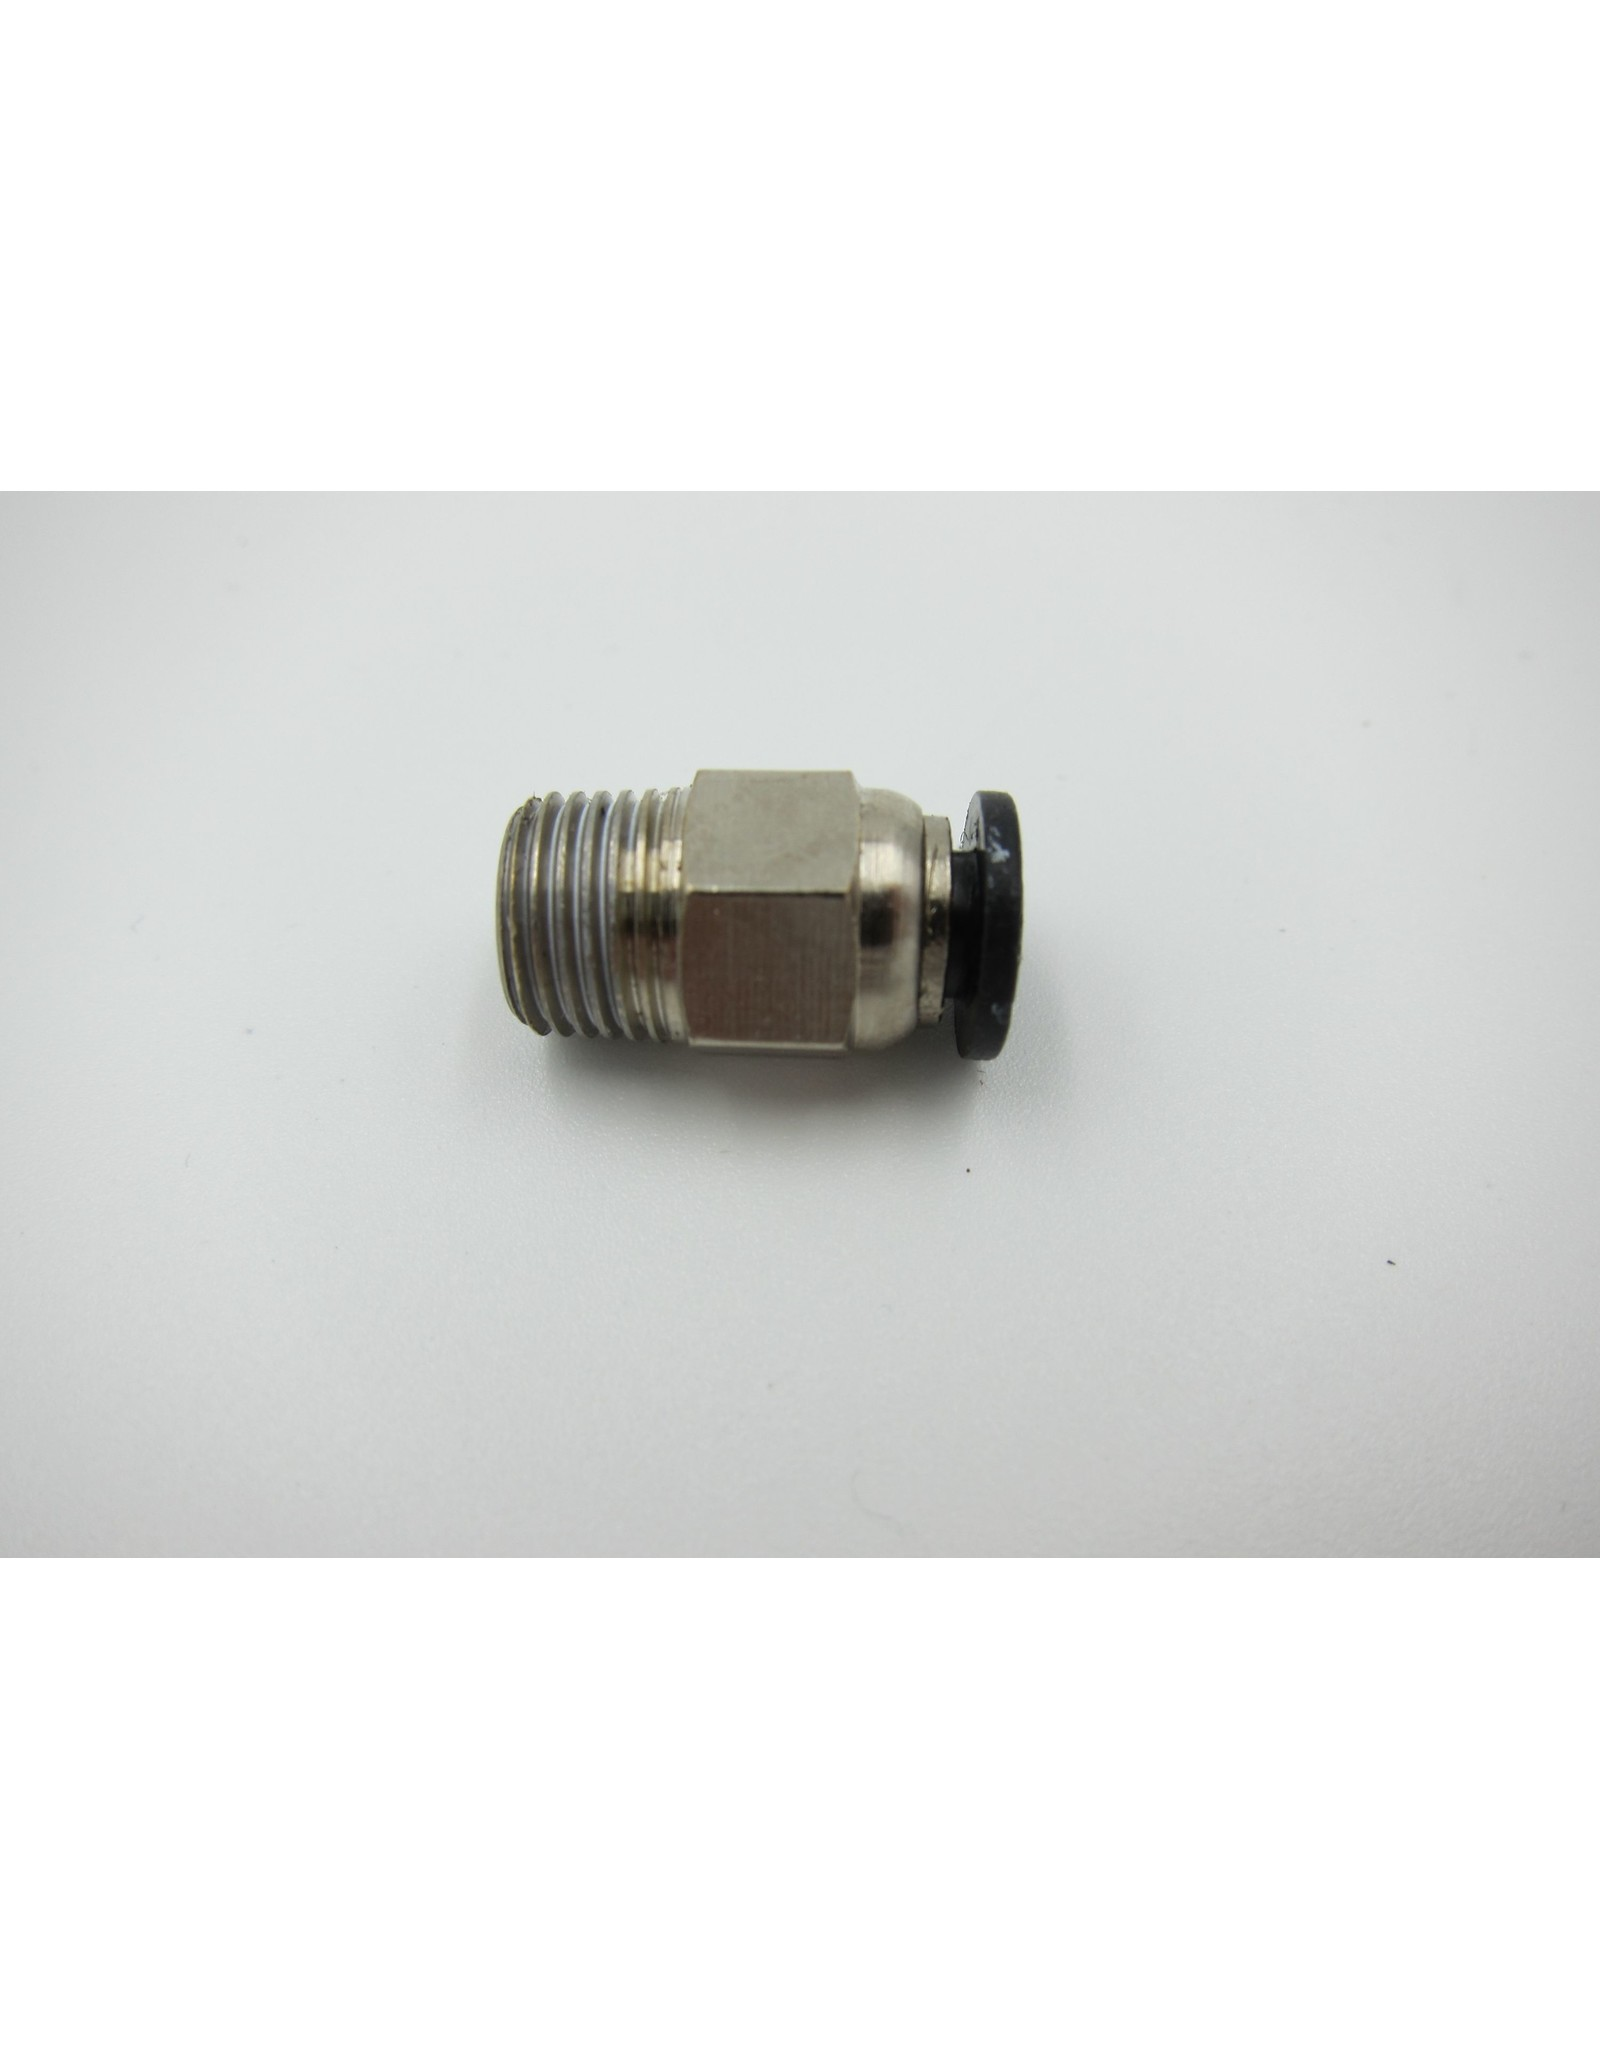 Wanhao Wanhao Duplicator i3 Mini - Joint coupler / Filament tube connector